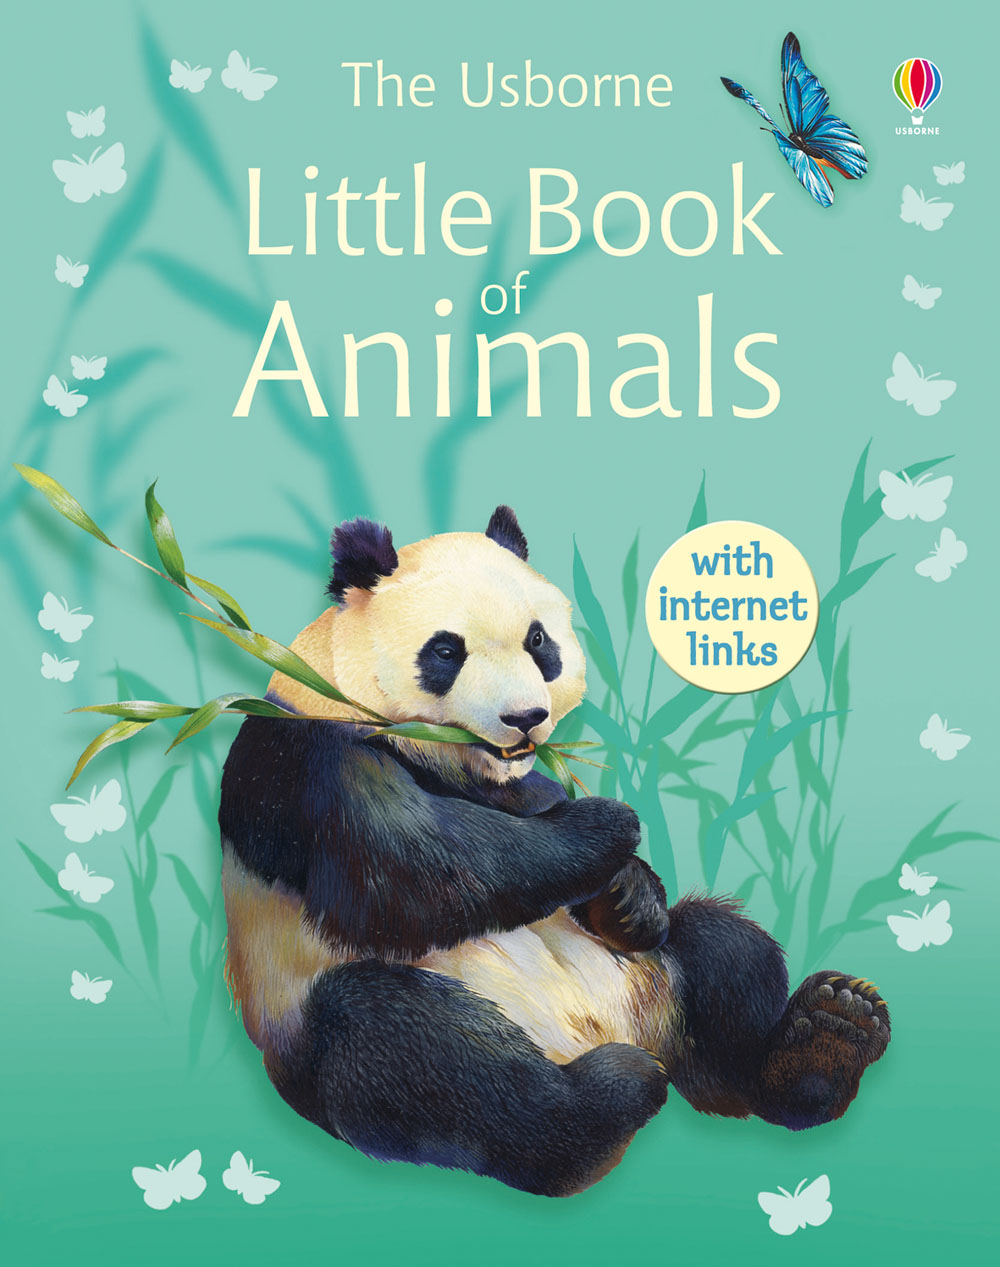 Little book of animals at Usborne Childrens Books